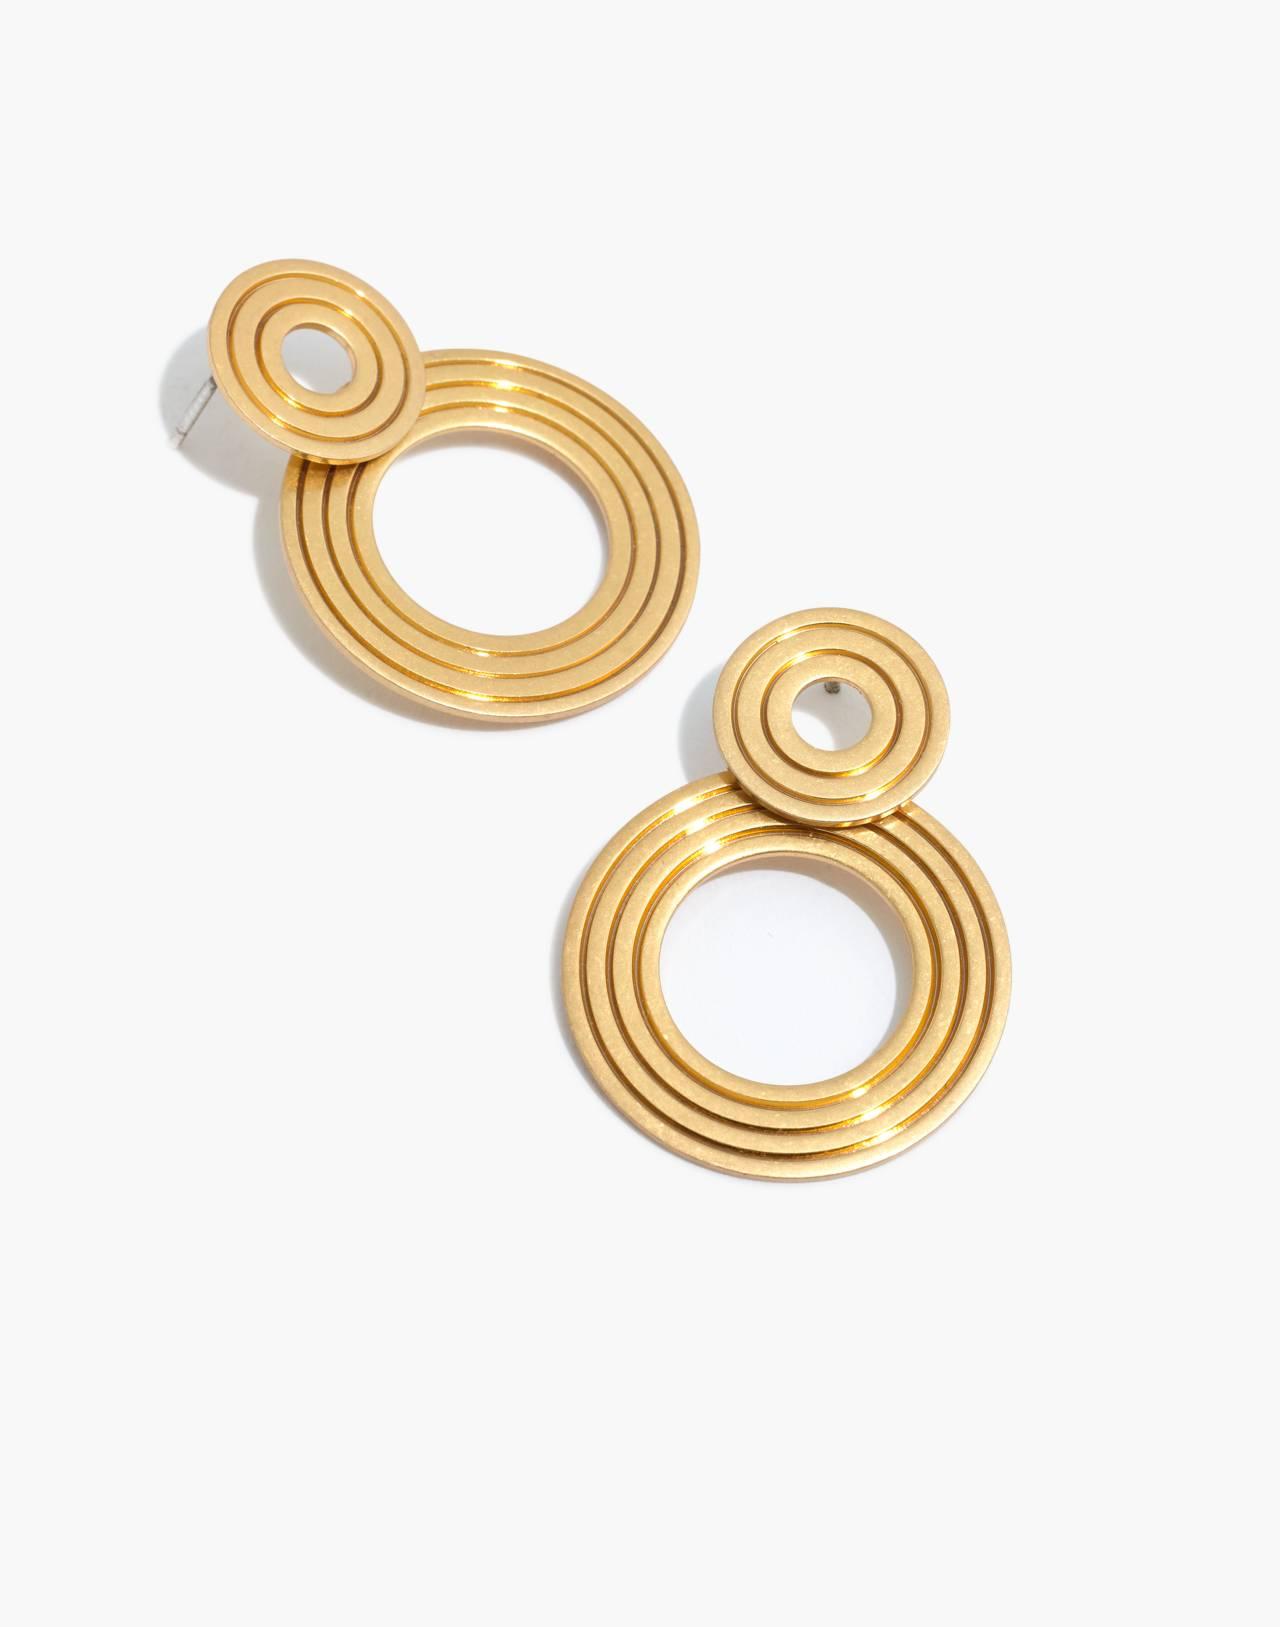 Etched Interlock Earrings in vintage gold image 1